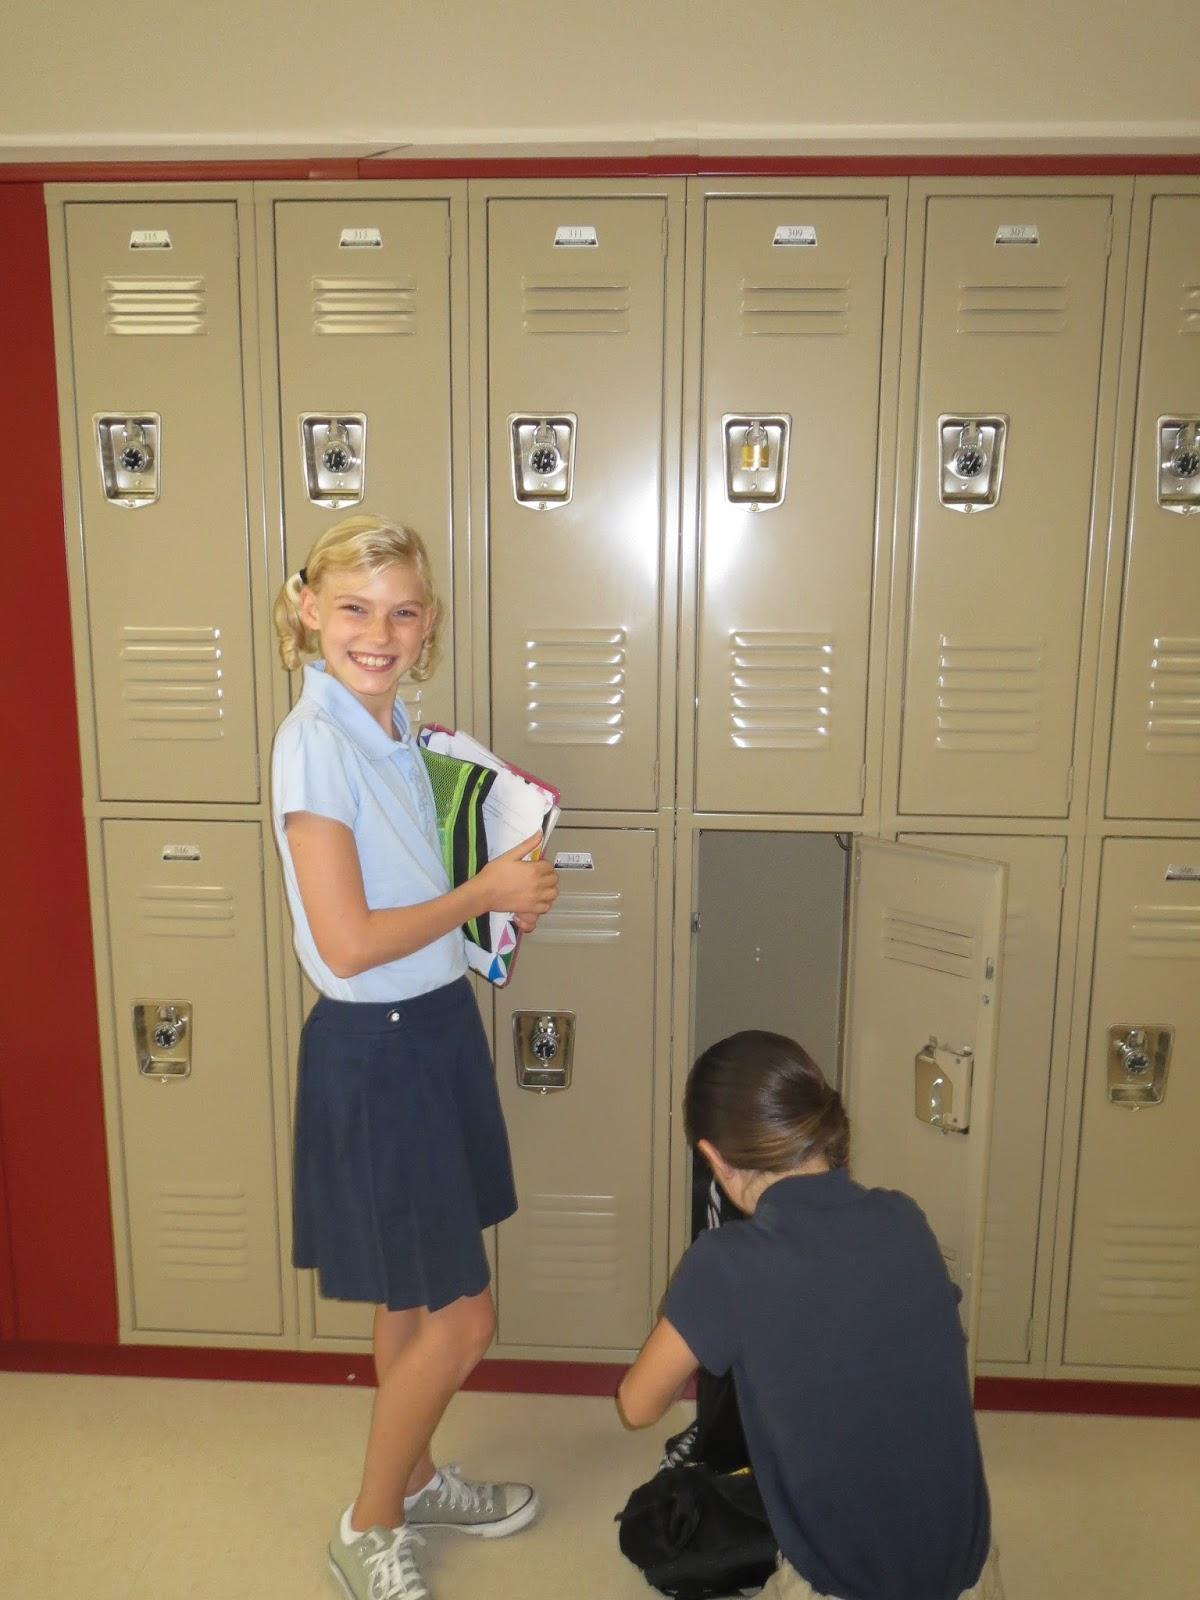 School locker room girls peeing, teen cum gif porn